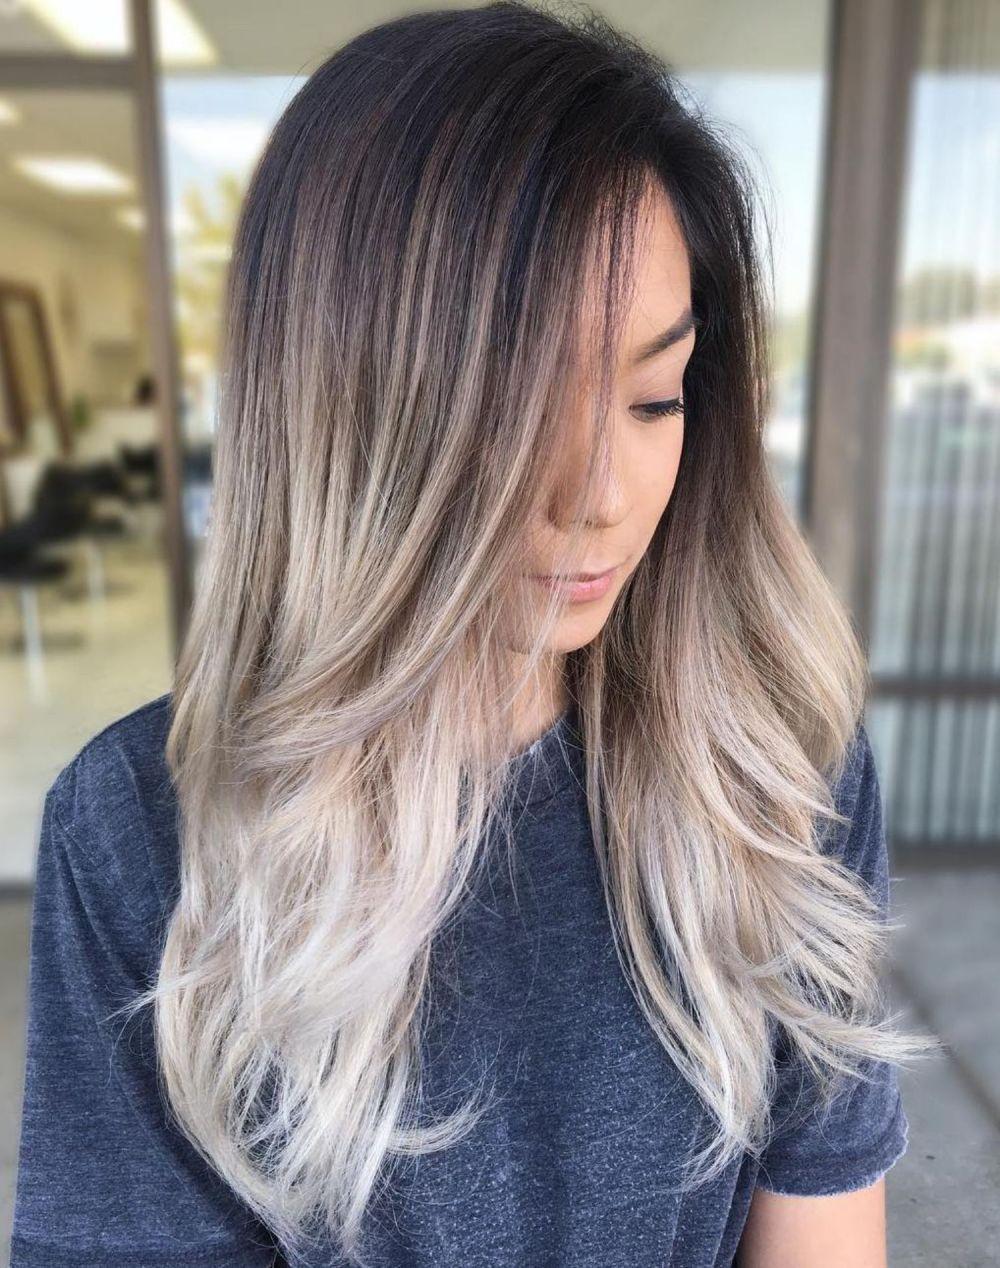 20 Natural Looking Brunette Balayage Styles Balayage Brunette Ombre Hair Blonde Ash Blonde Balayage Dark